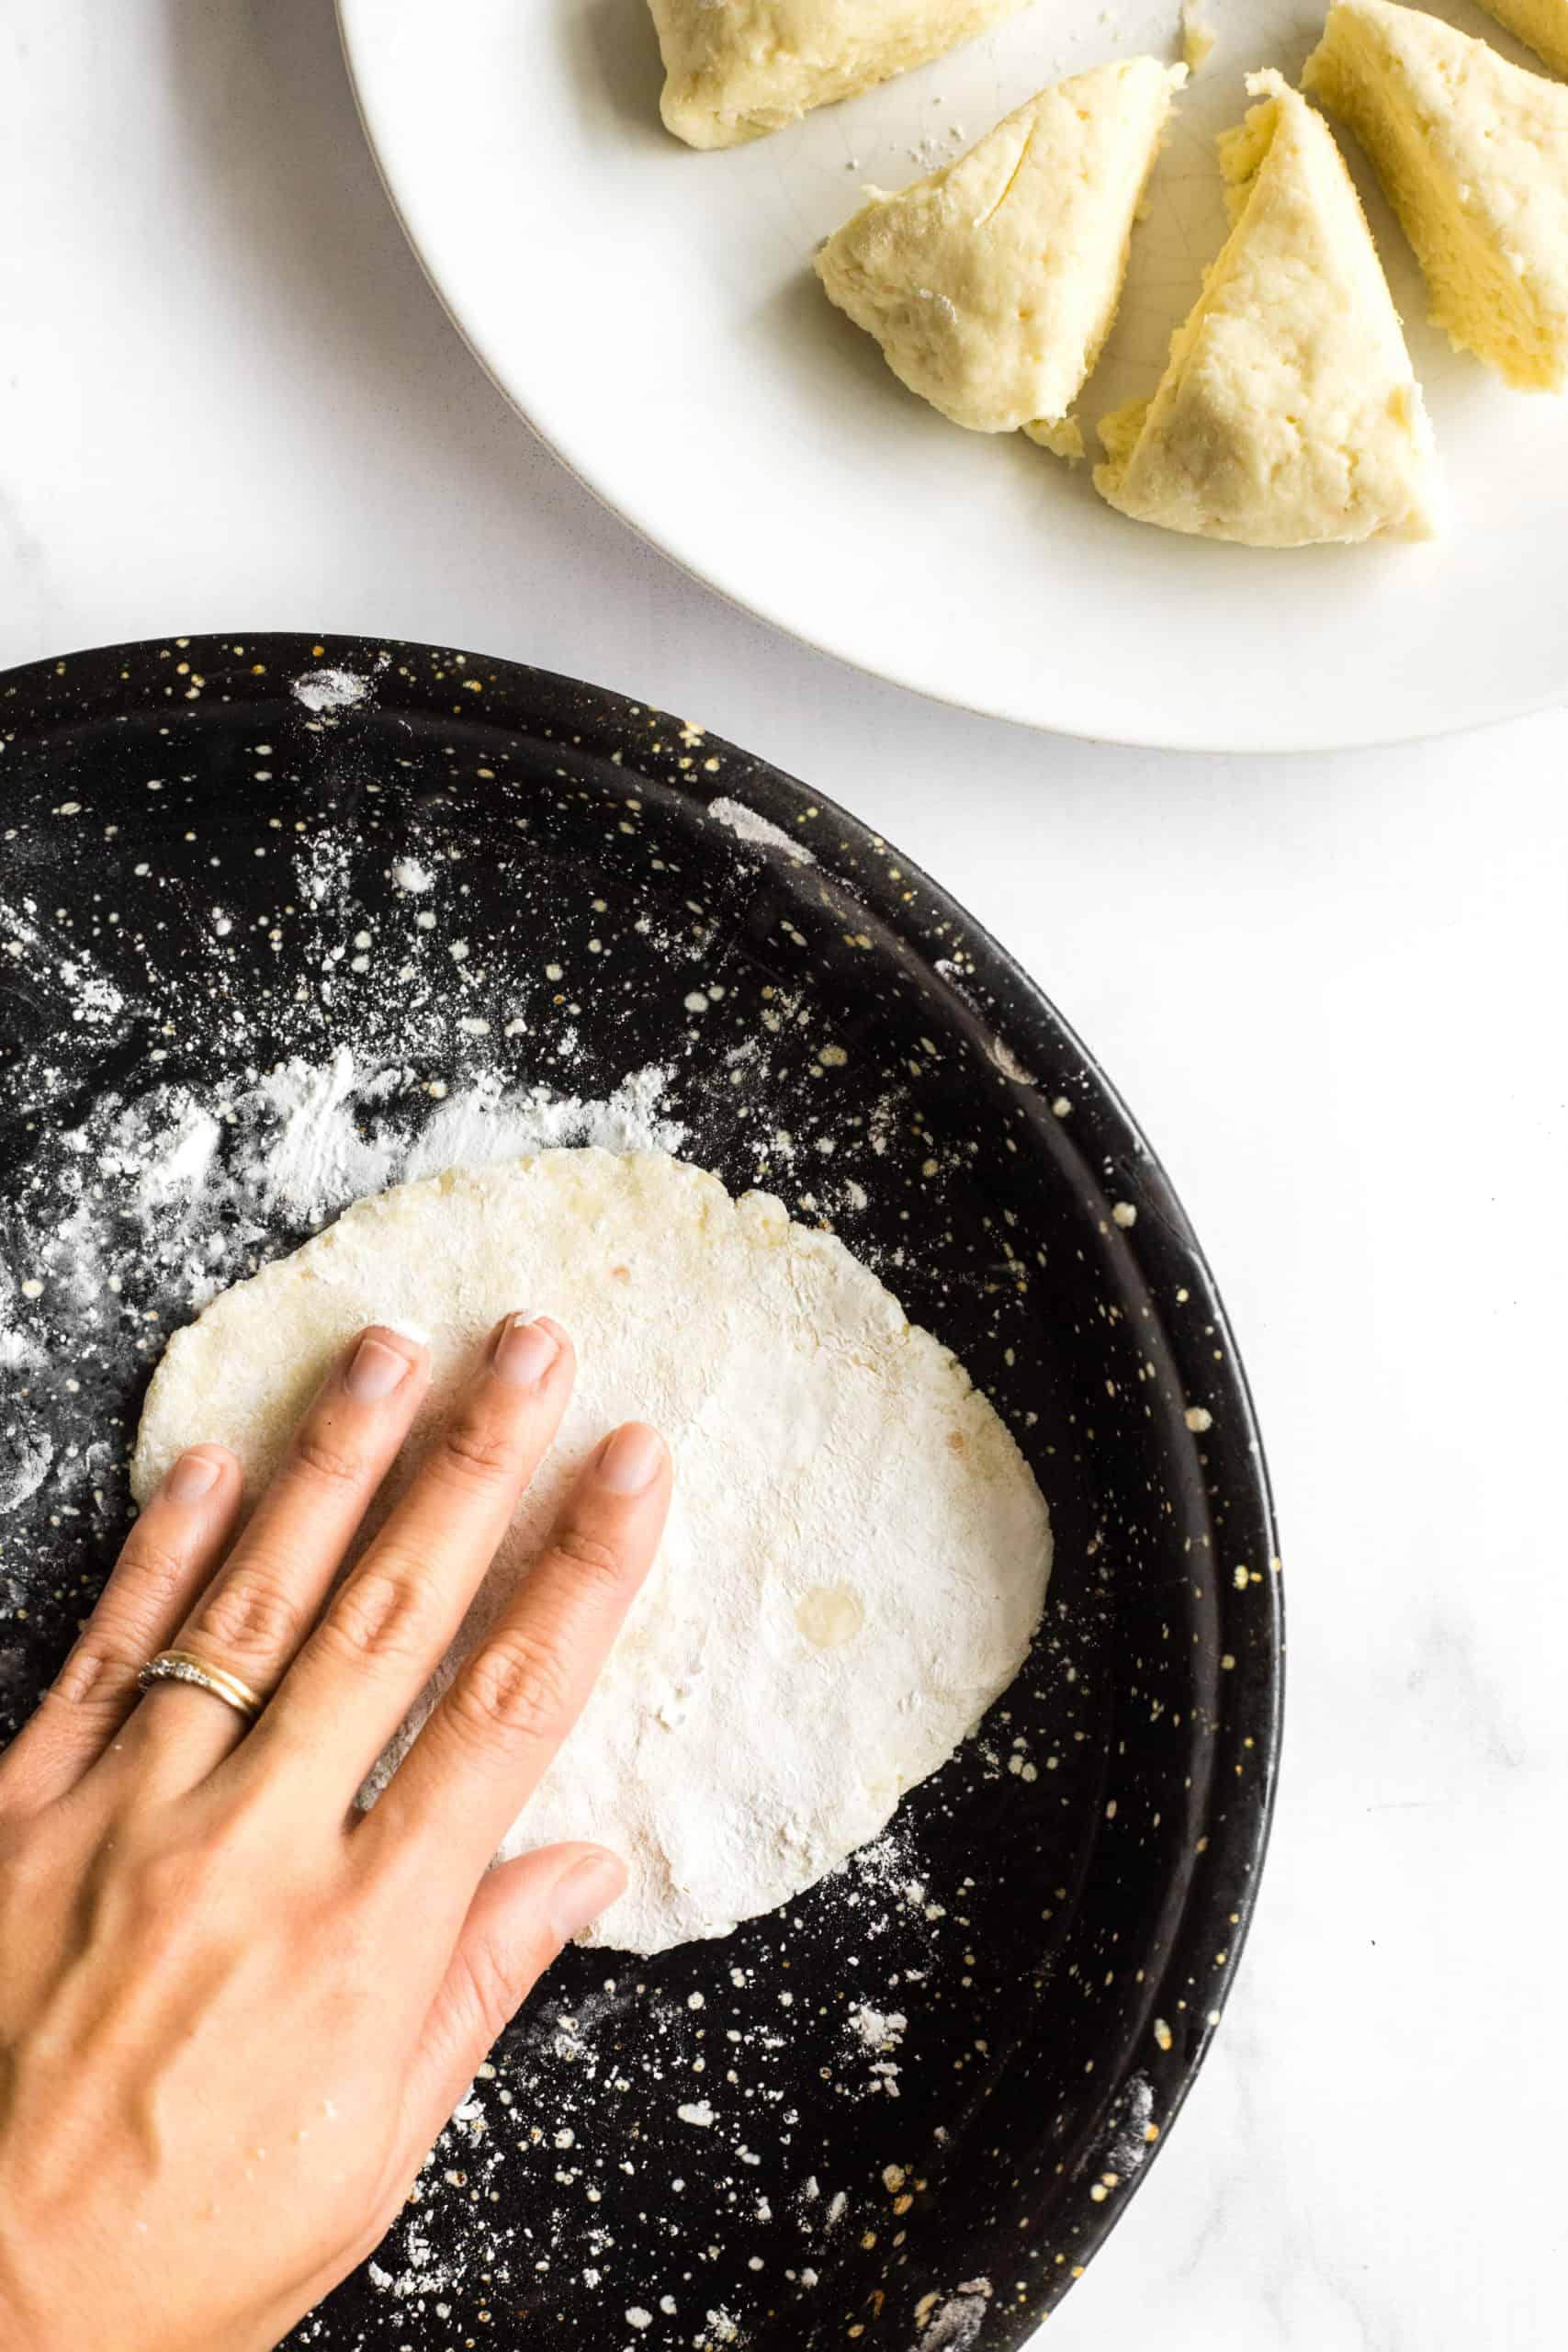 Flattening the gluten-free naan dough with fingers.